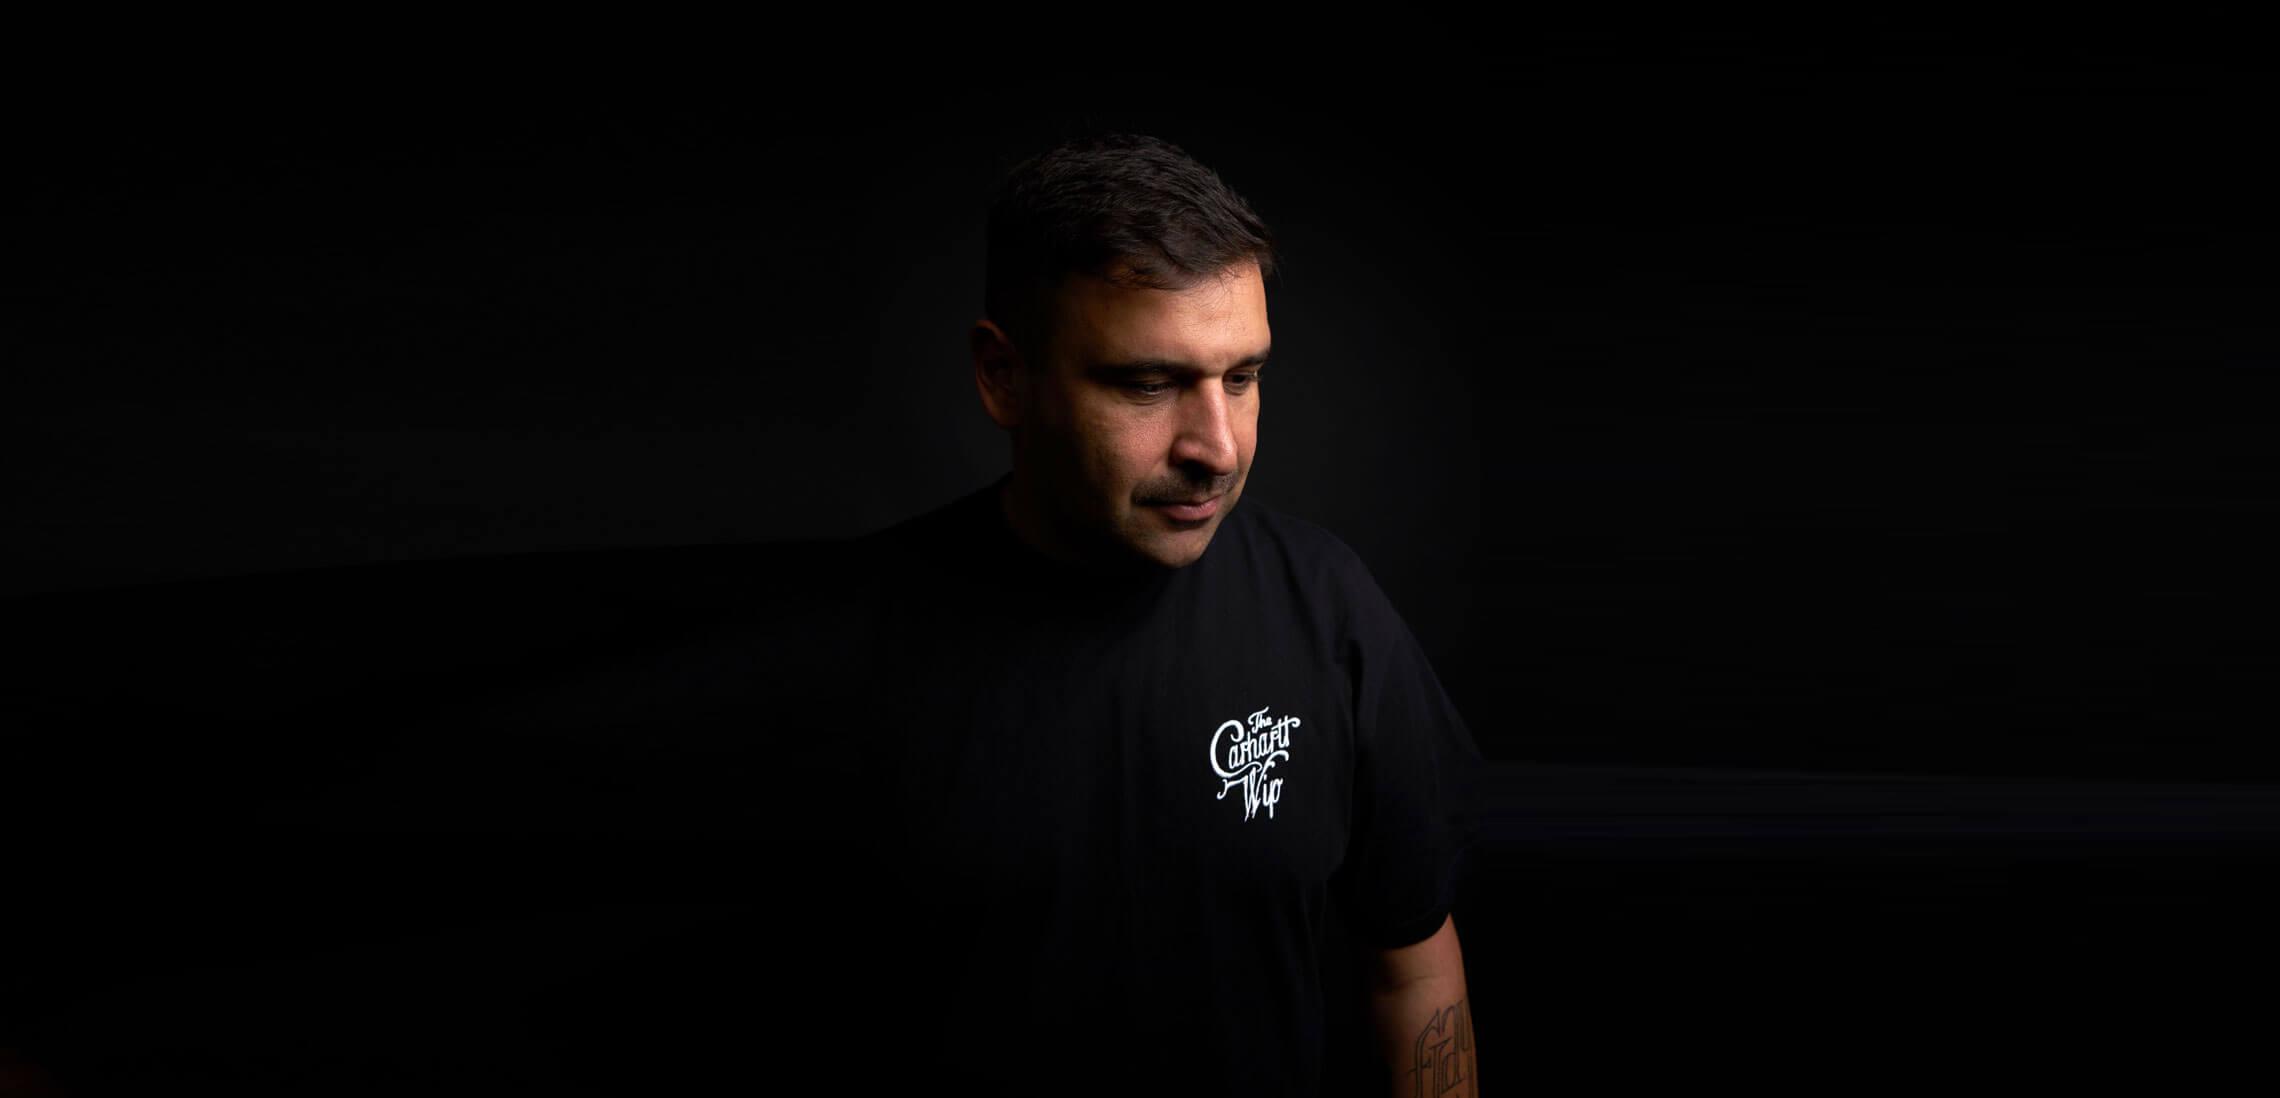 Javier Carballo presents TERMS - Loud Jam hero